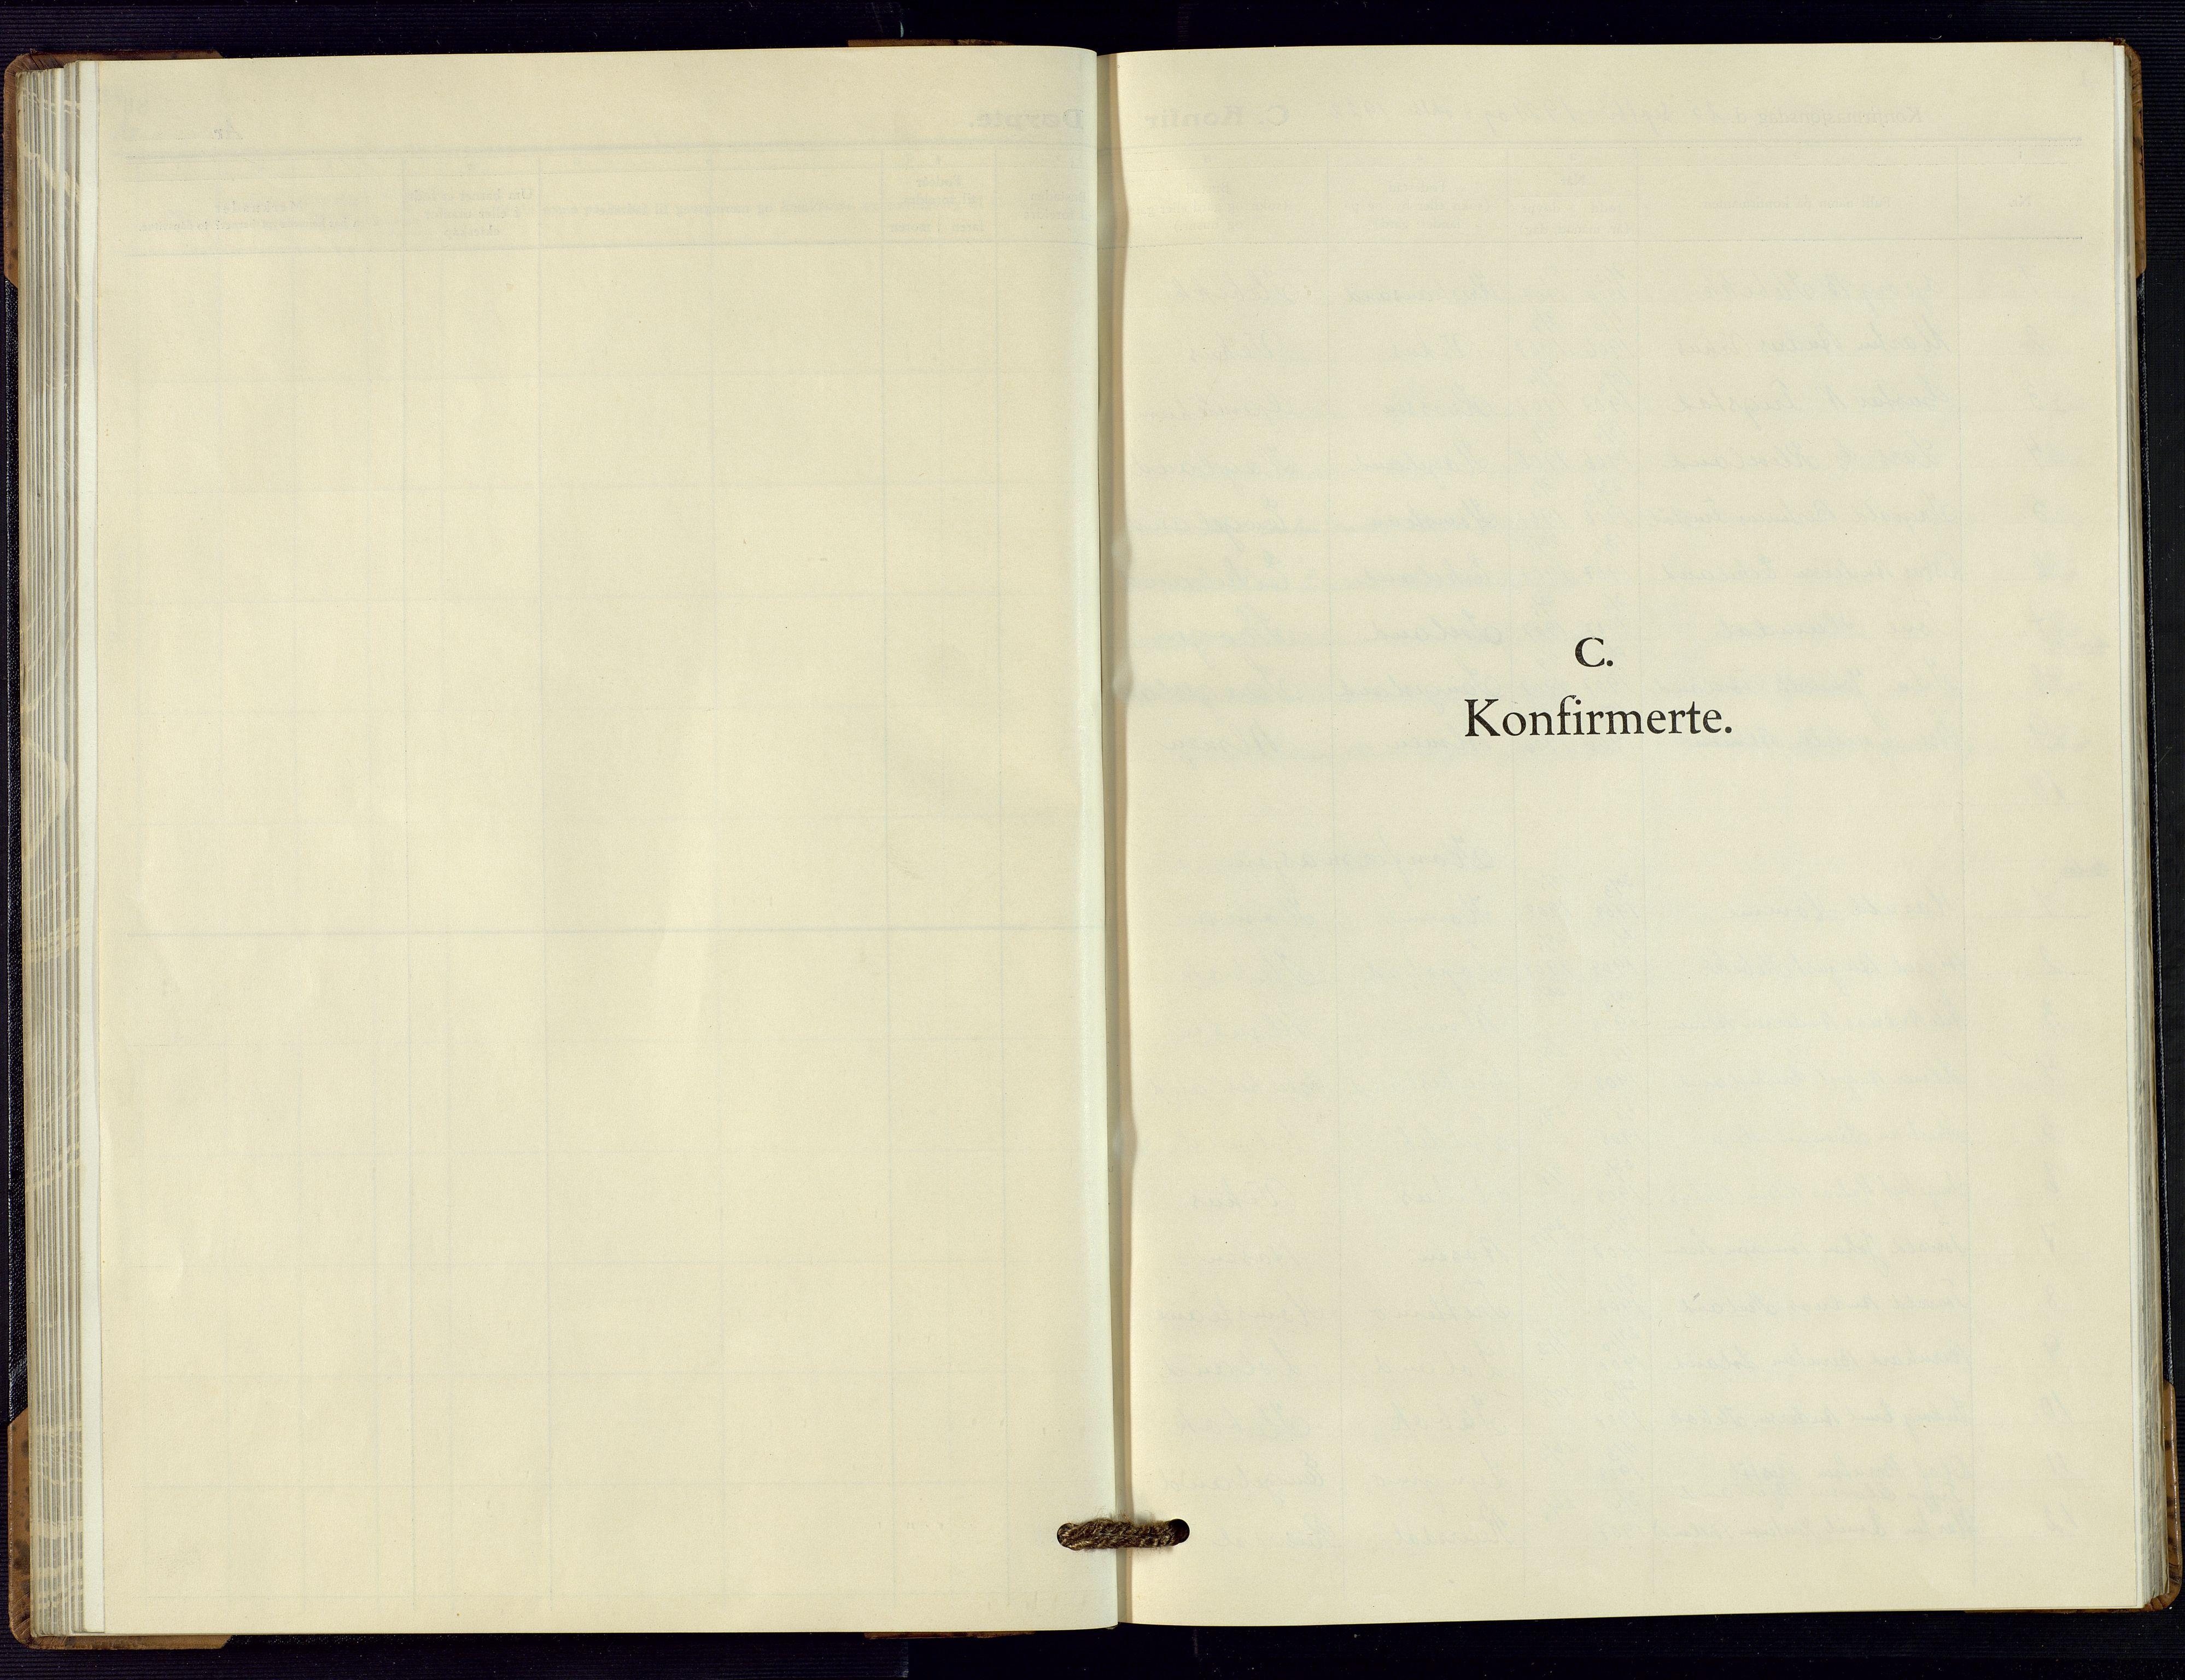 SAK, Vennesla sokneprestkontor, Fb/Fbc/L0004: Klokkerbok nr. B 4, 1921-1972